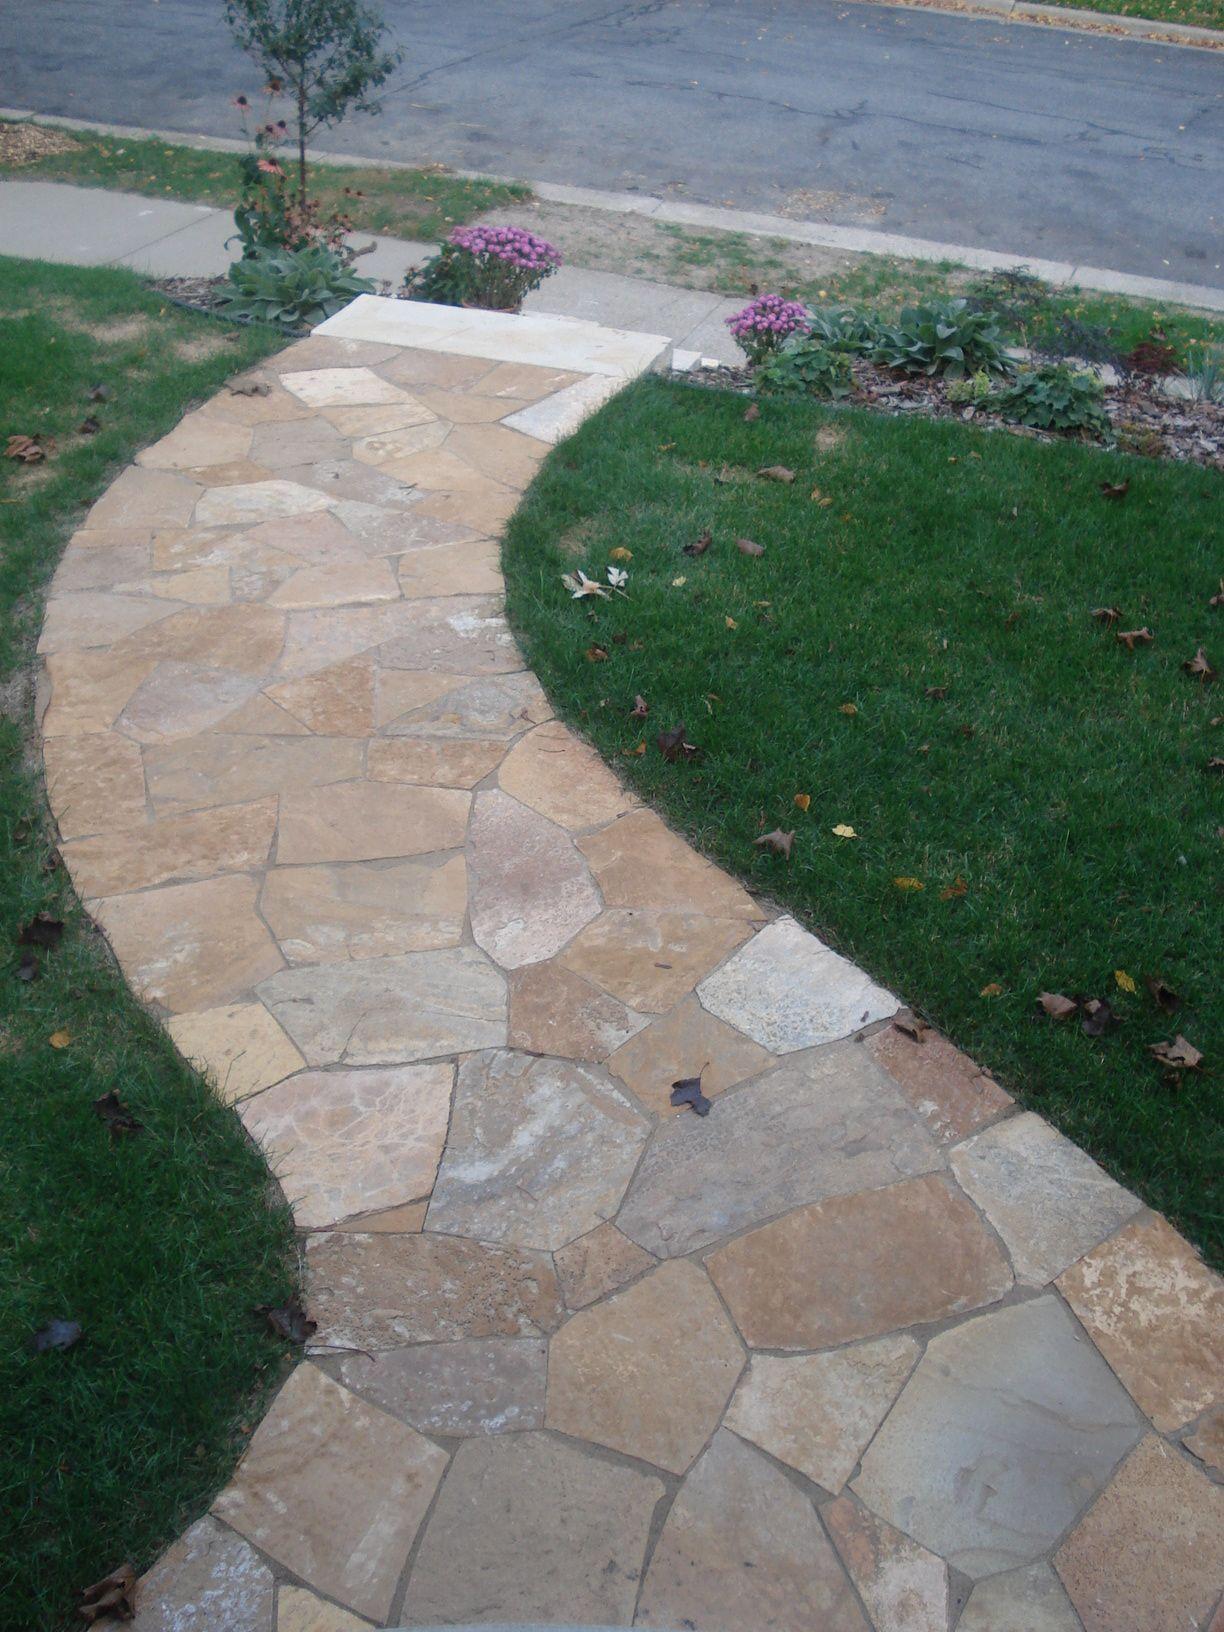 Flagstone Walkway Design Ideas home decorating ideas home improvement cleaning organization tips Desert Bronze Flagstone Walkway